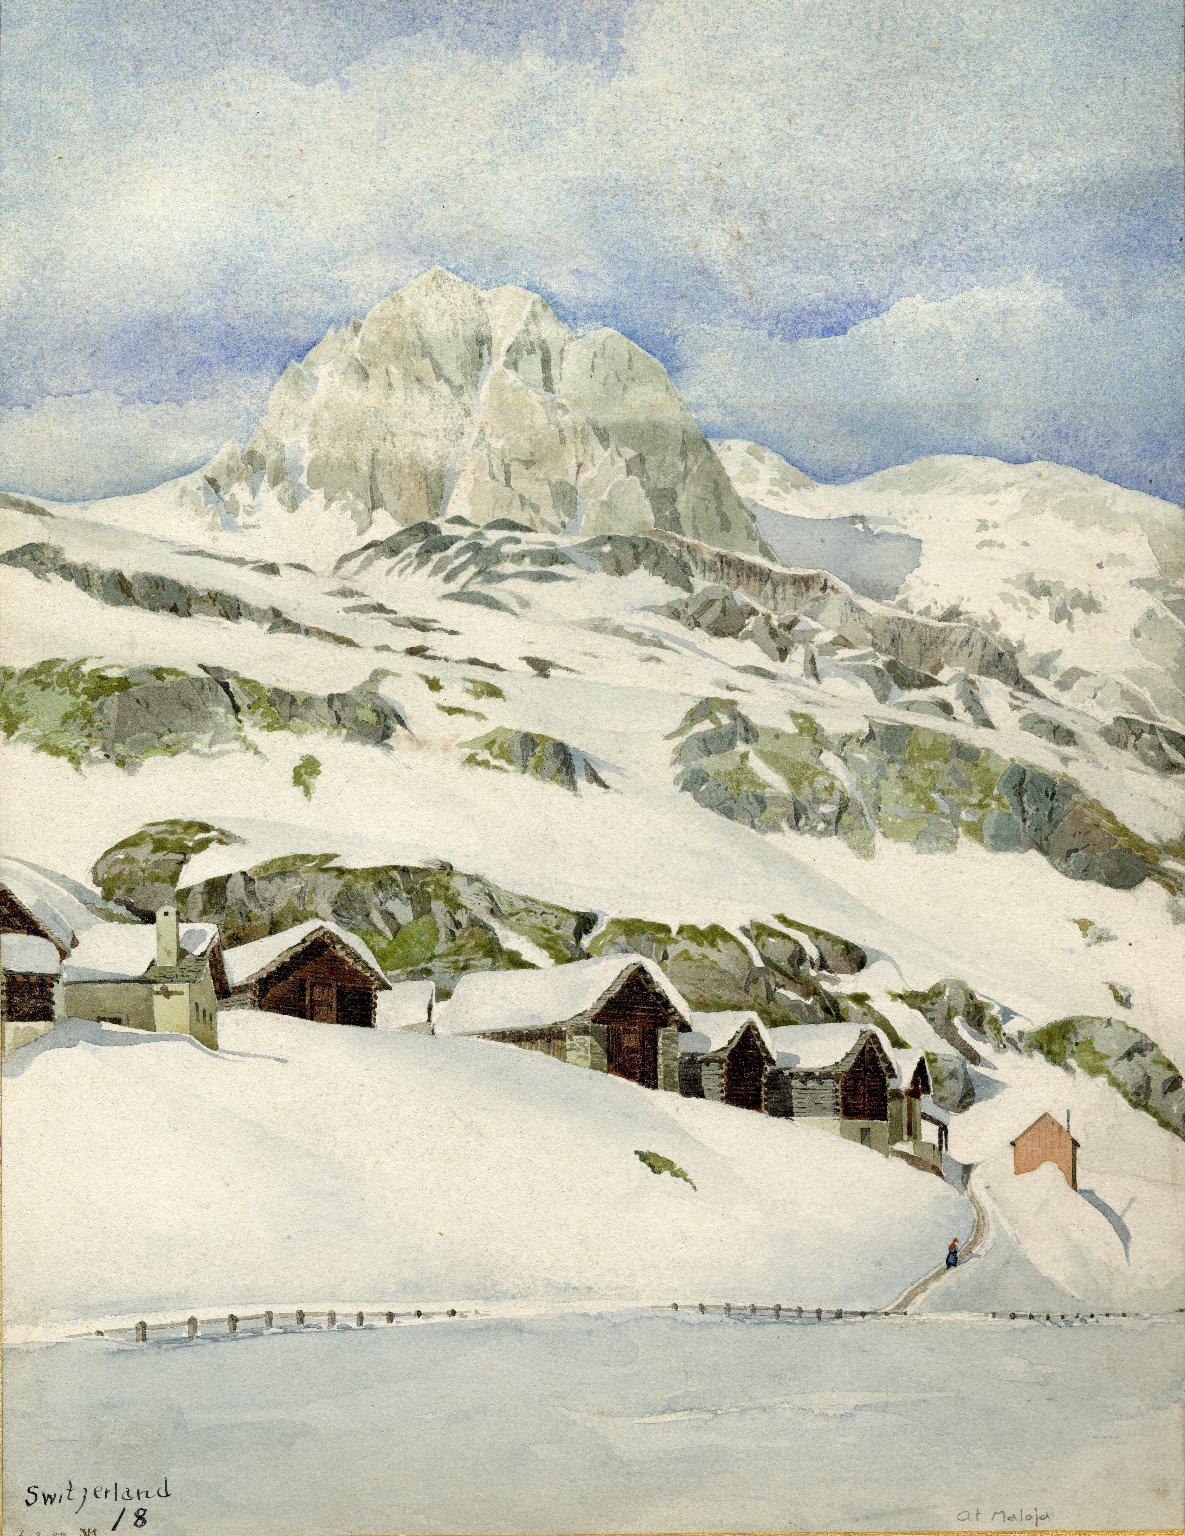 Snowy landscape at Maloja, Switzerland